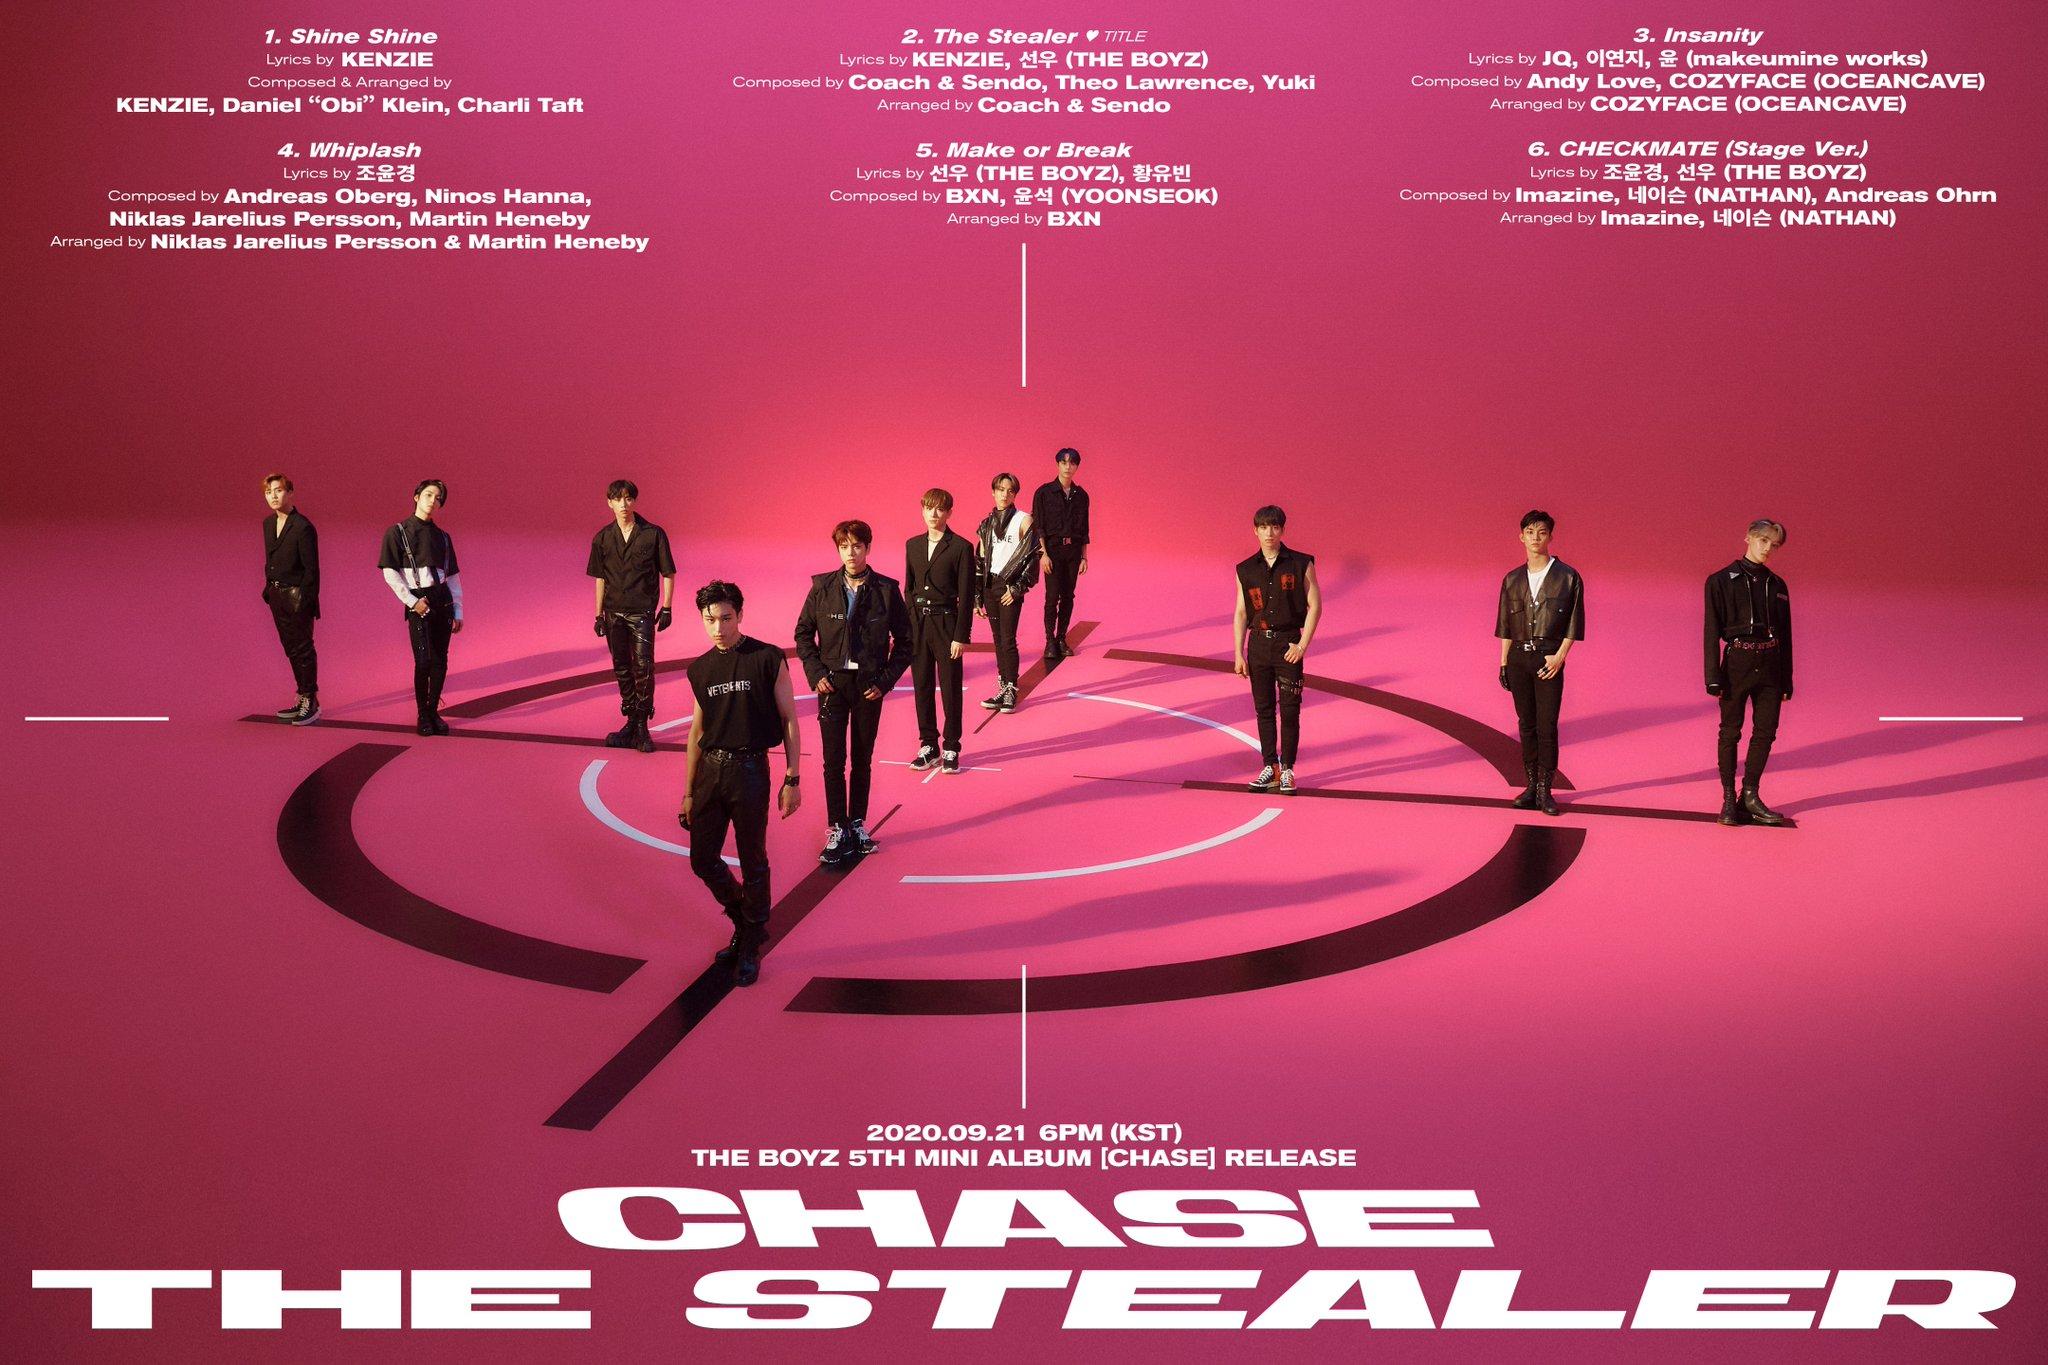 The Boyz Track List